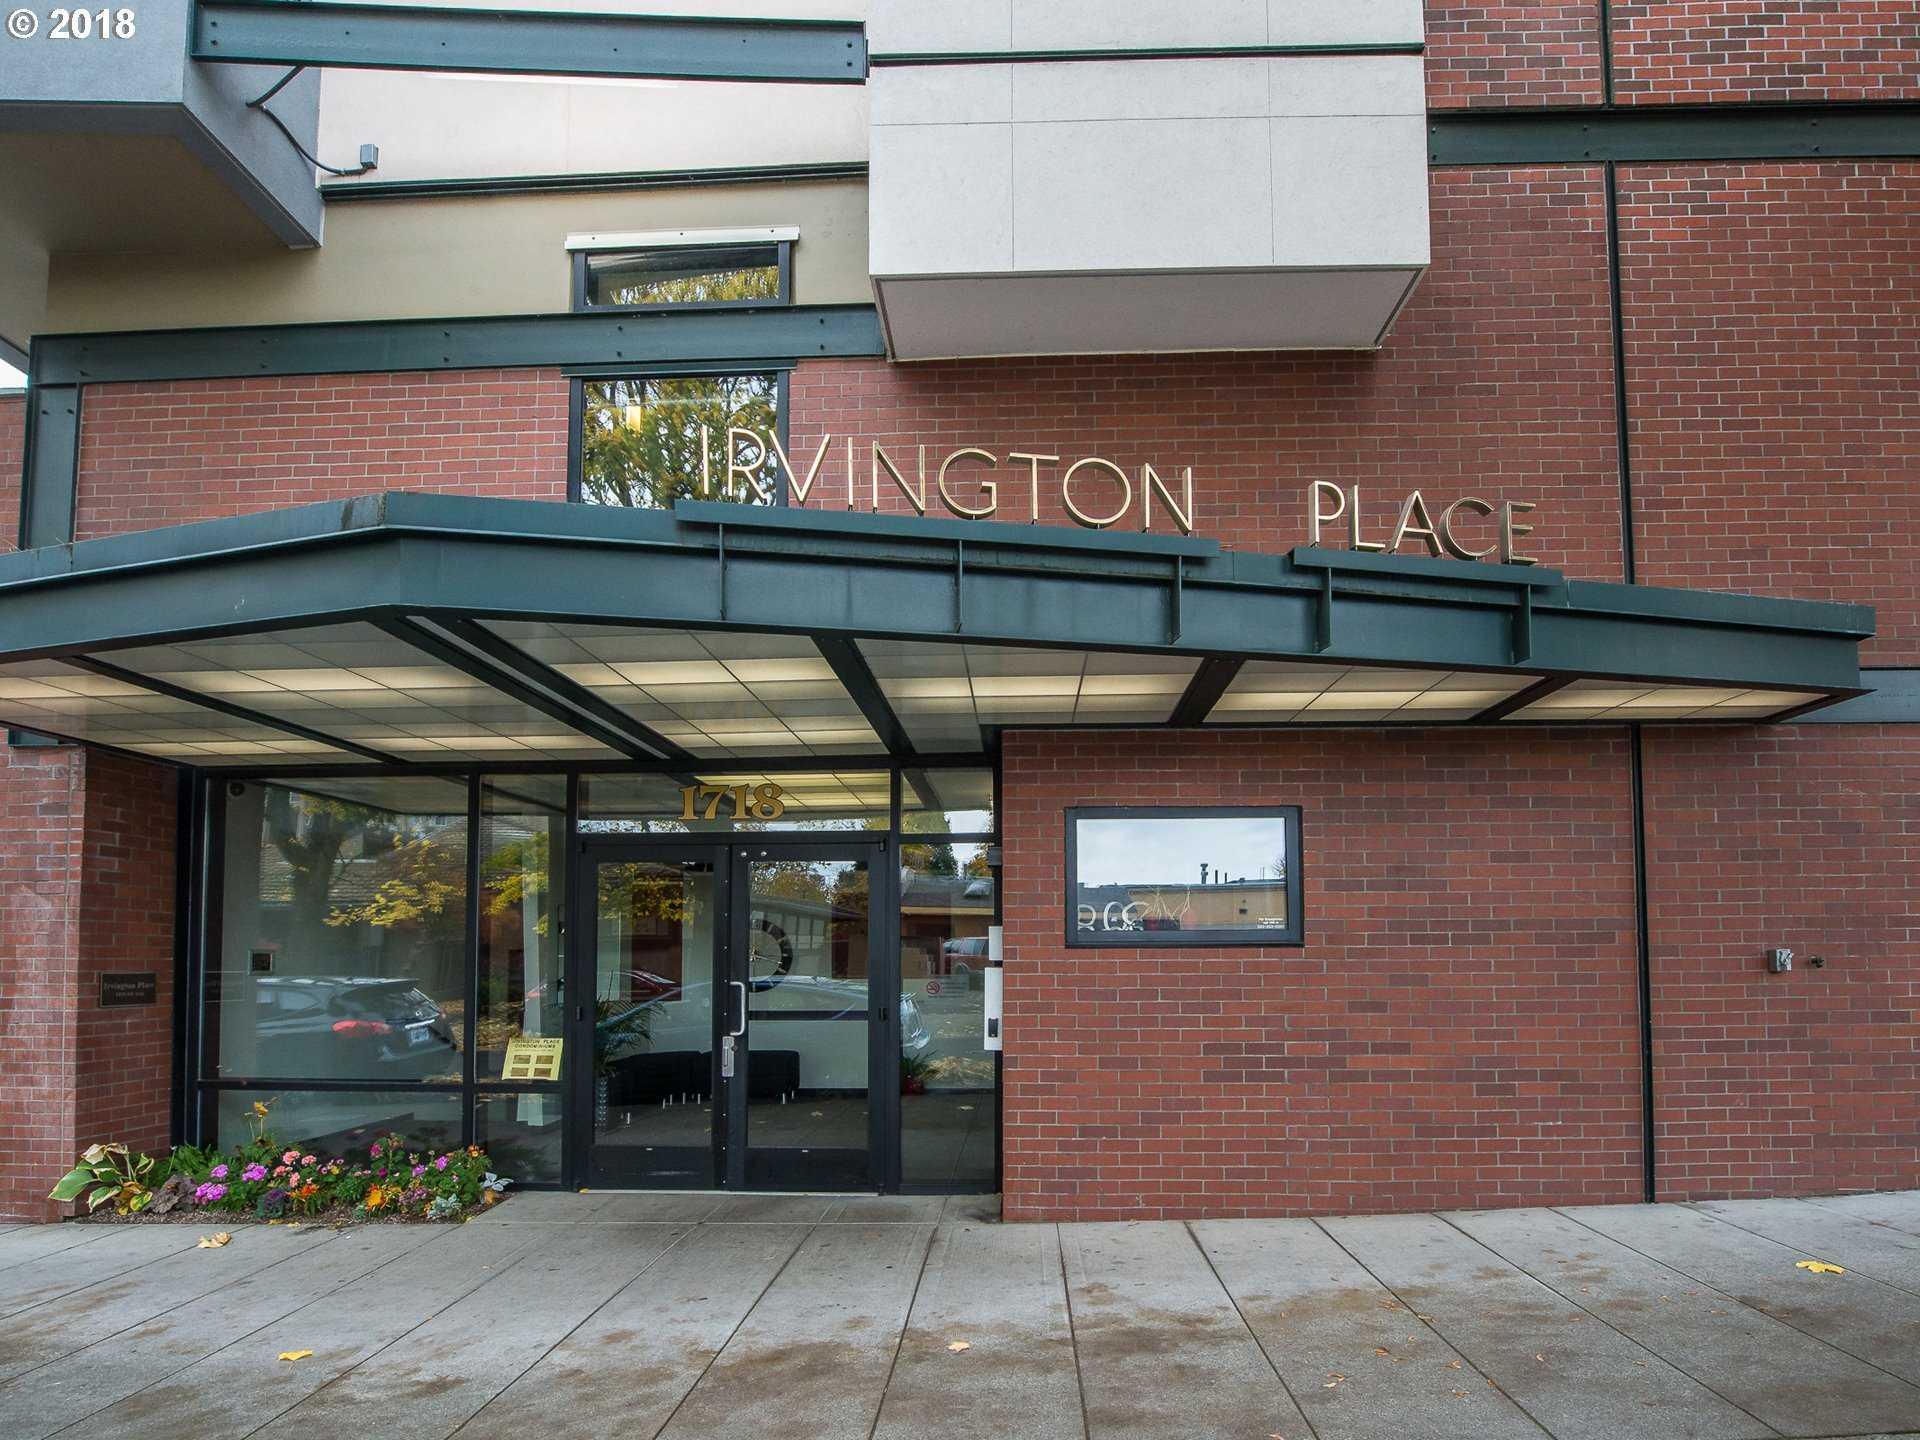 $314,999 - 1Br/1Ba -  for Sale in Irvington Place Condominiums, Portland